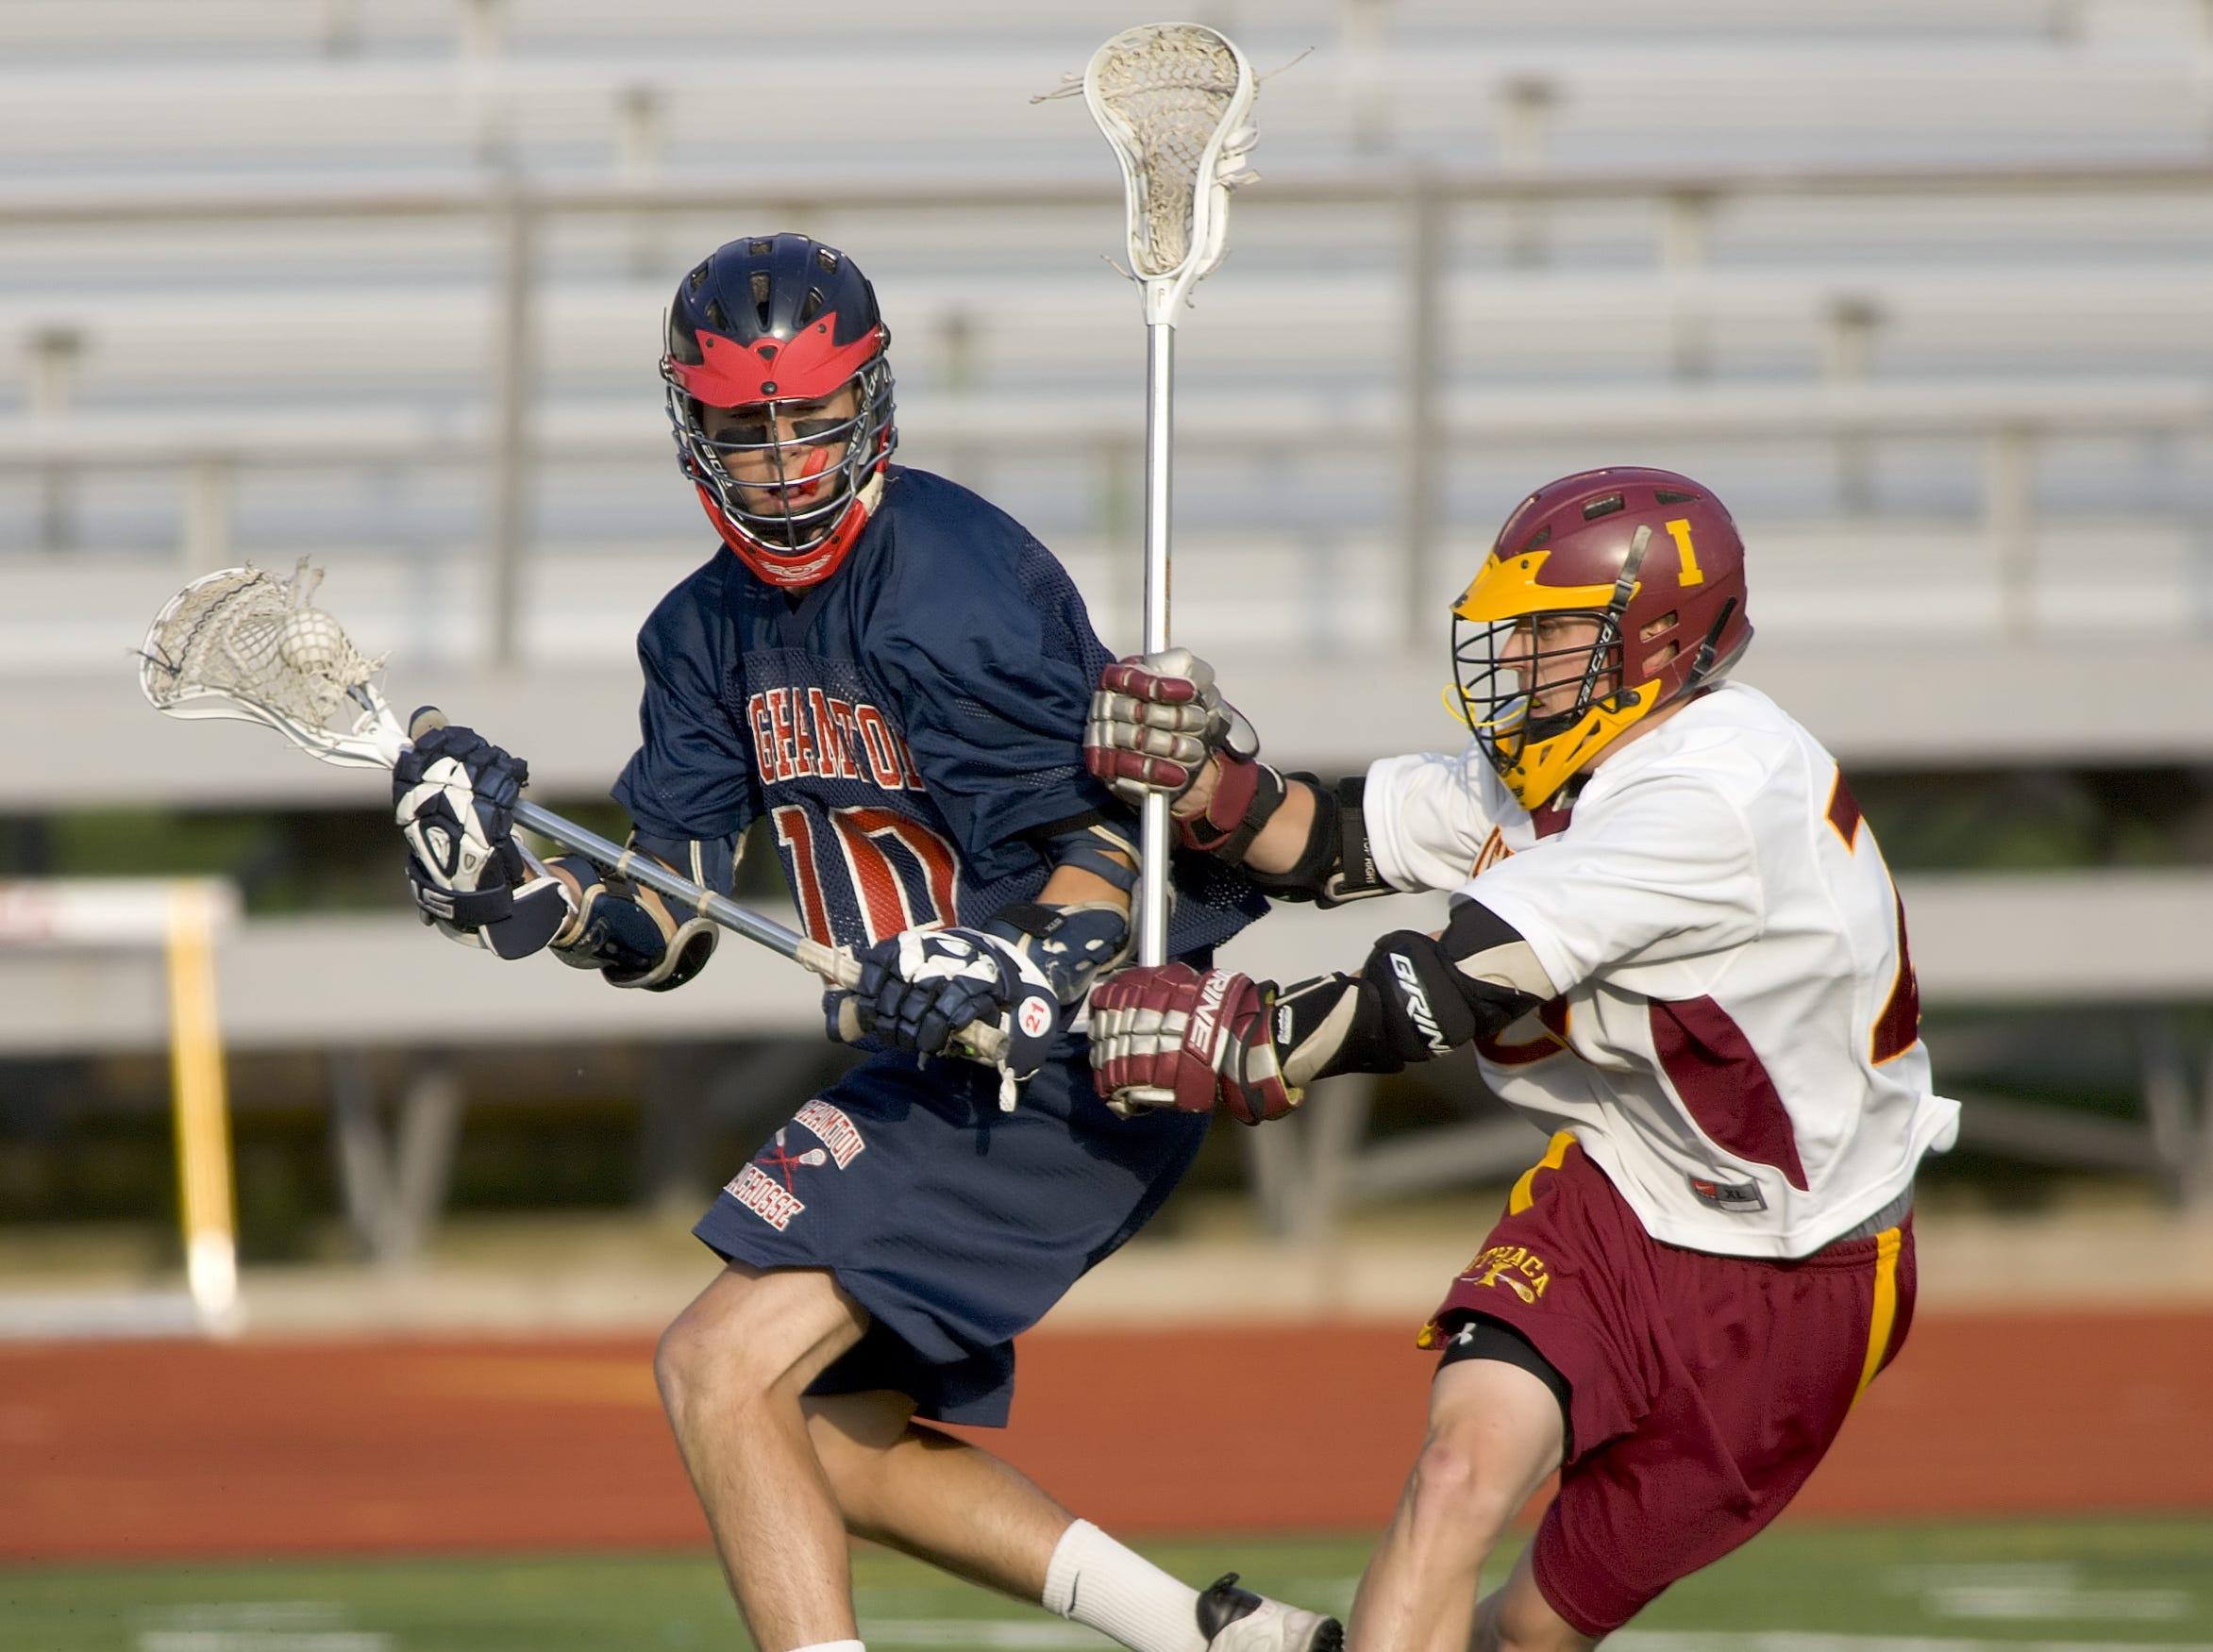 2009: Binghamton's James McAuliffe battles Ithaca's Benjamin Chase on Tuesday evening at Ithaca High School.